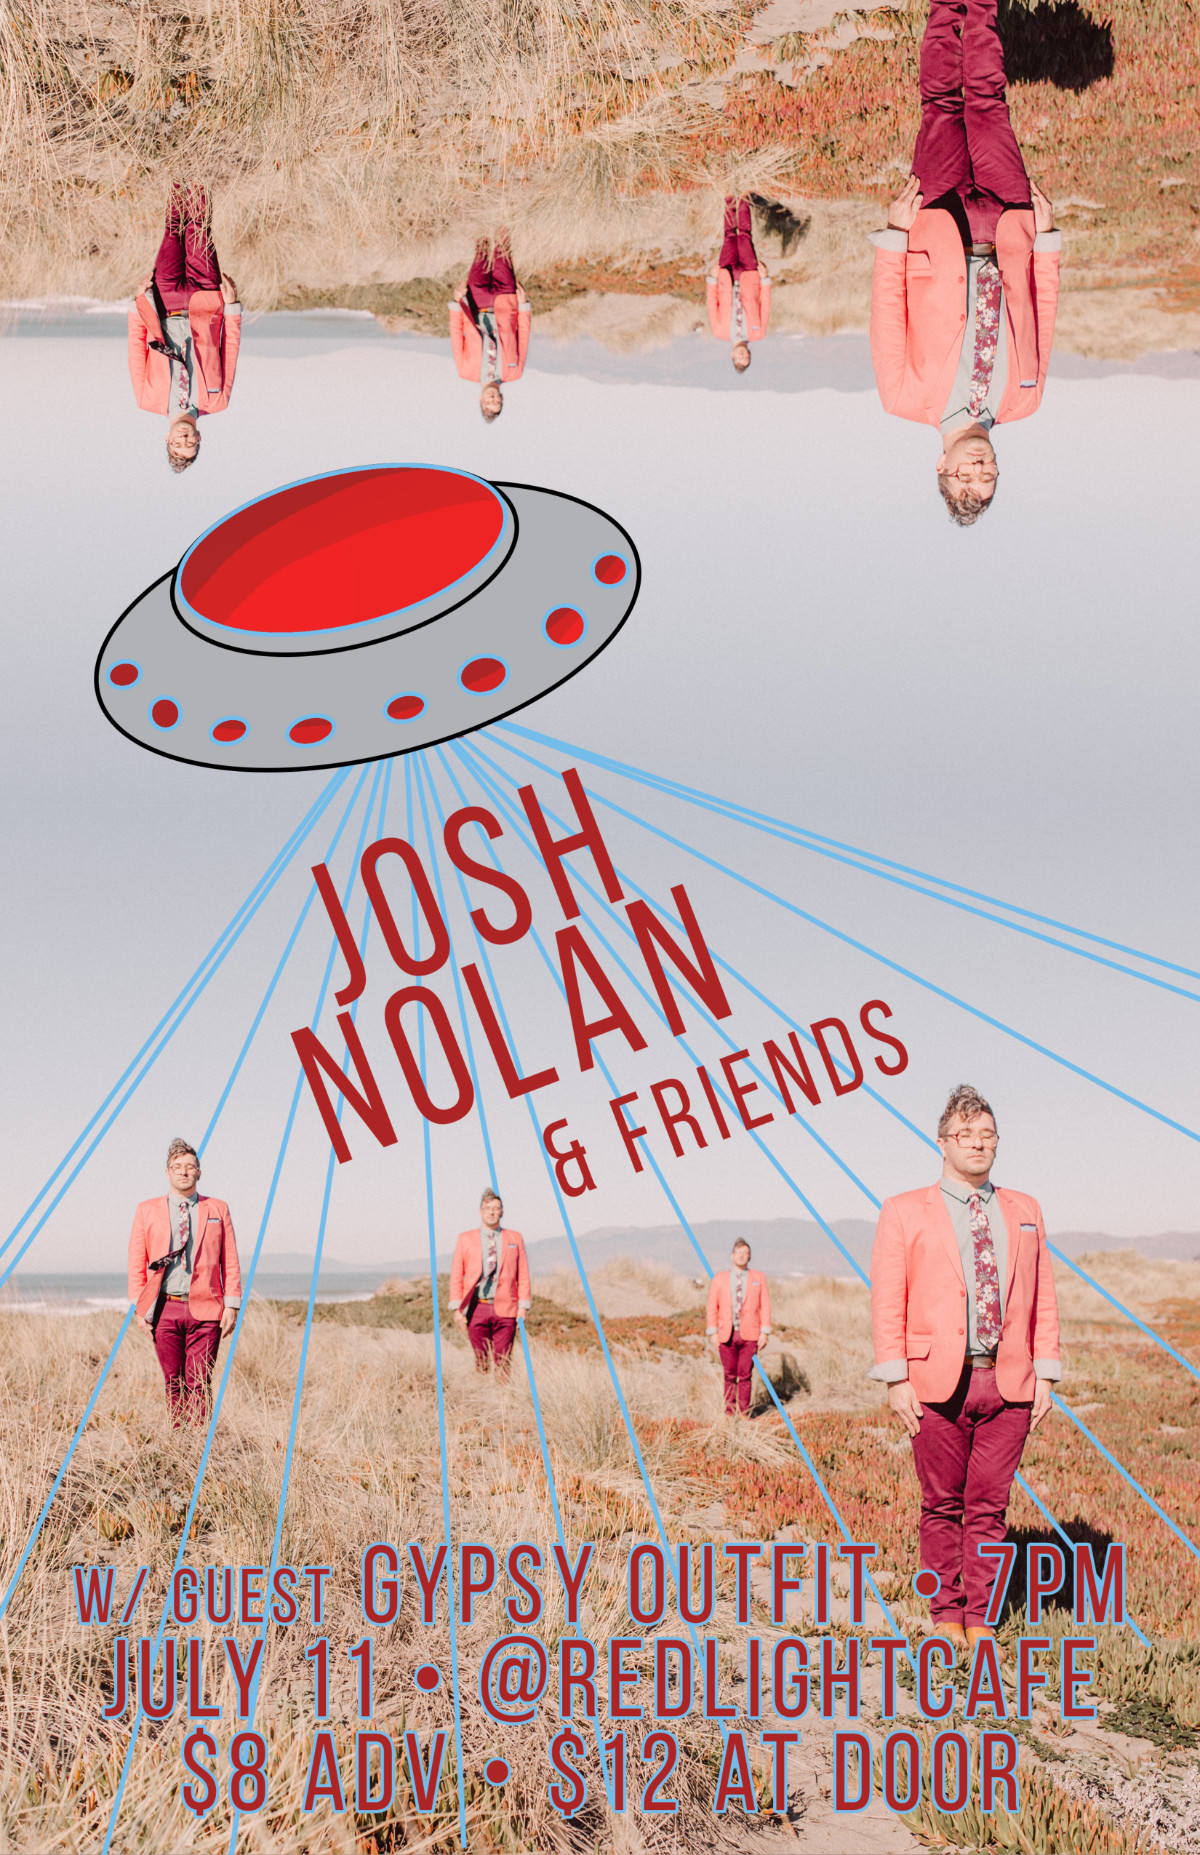 Josh Nolan (Band) w/ Gypsy Outfit — July 11, 2019 — Red Light Café, Atlanta, GA